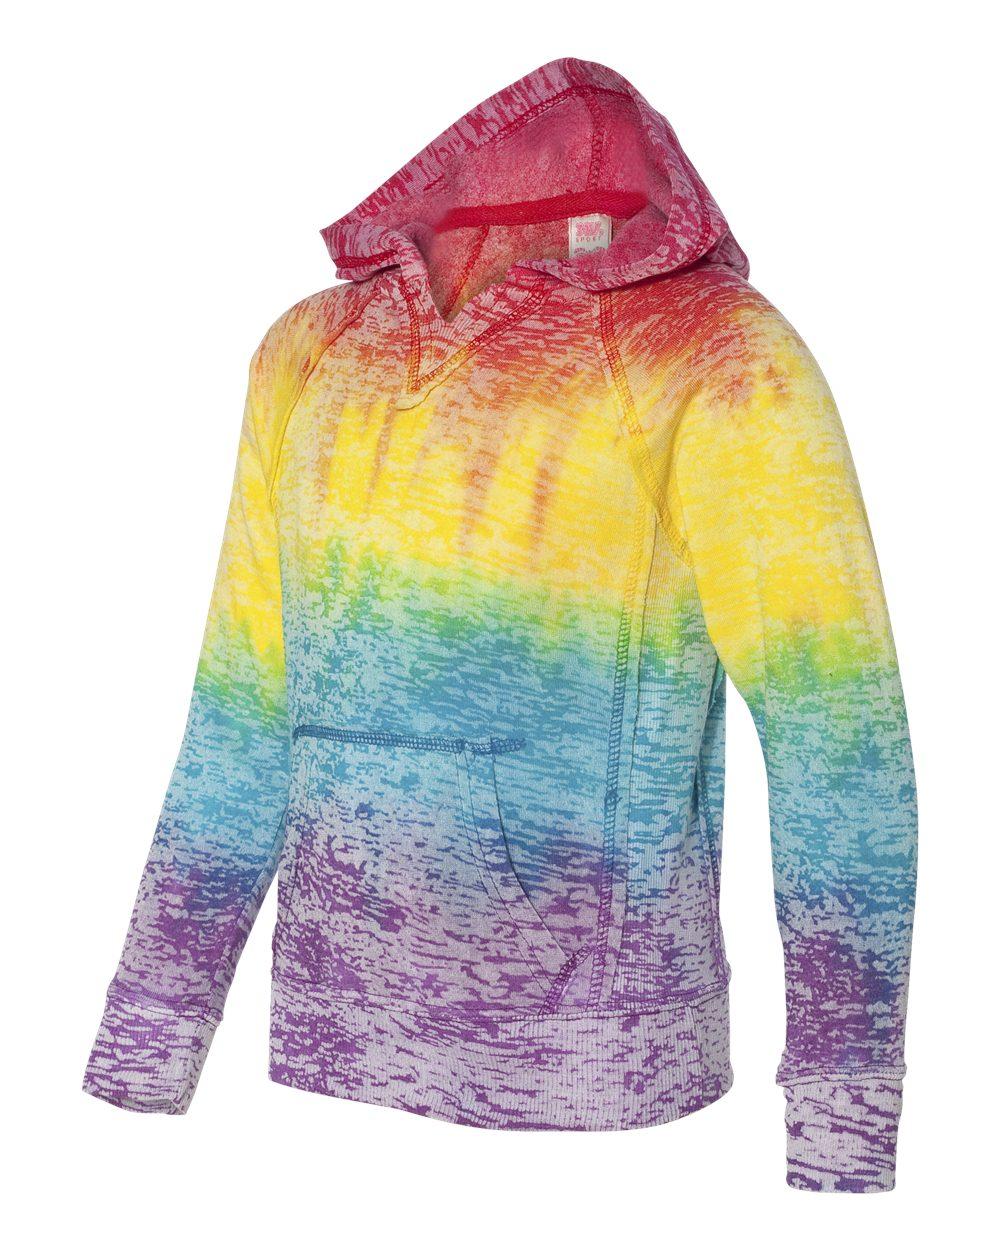 MV Sport Girls Courtney V Notch With Front Pouch Pocket Sweatshirt